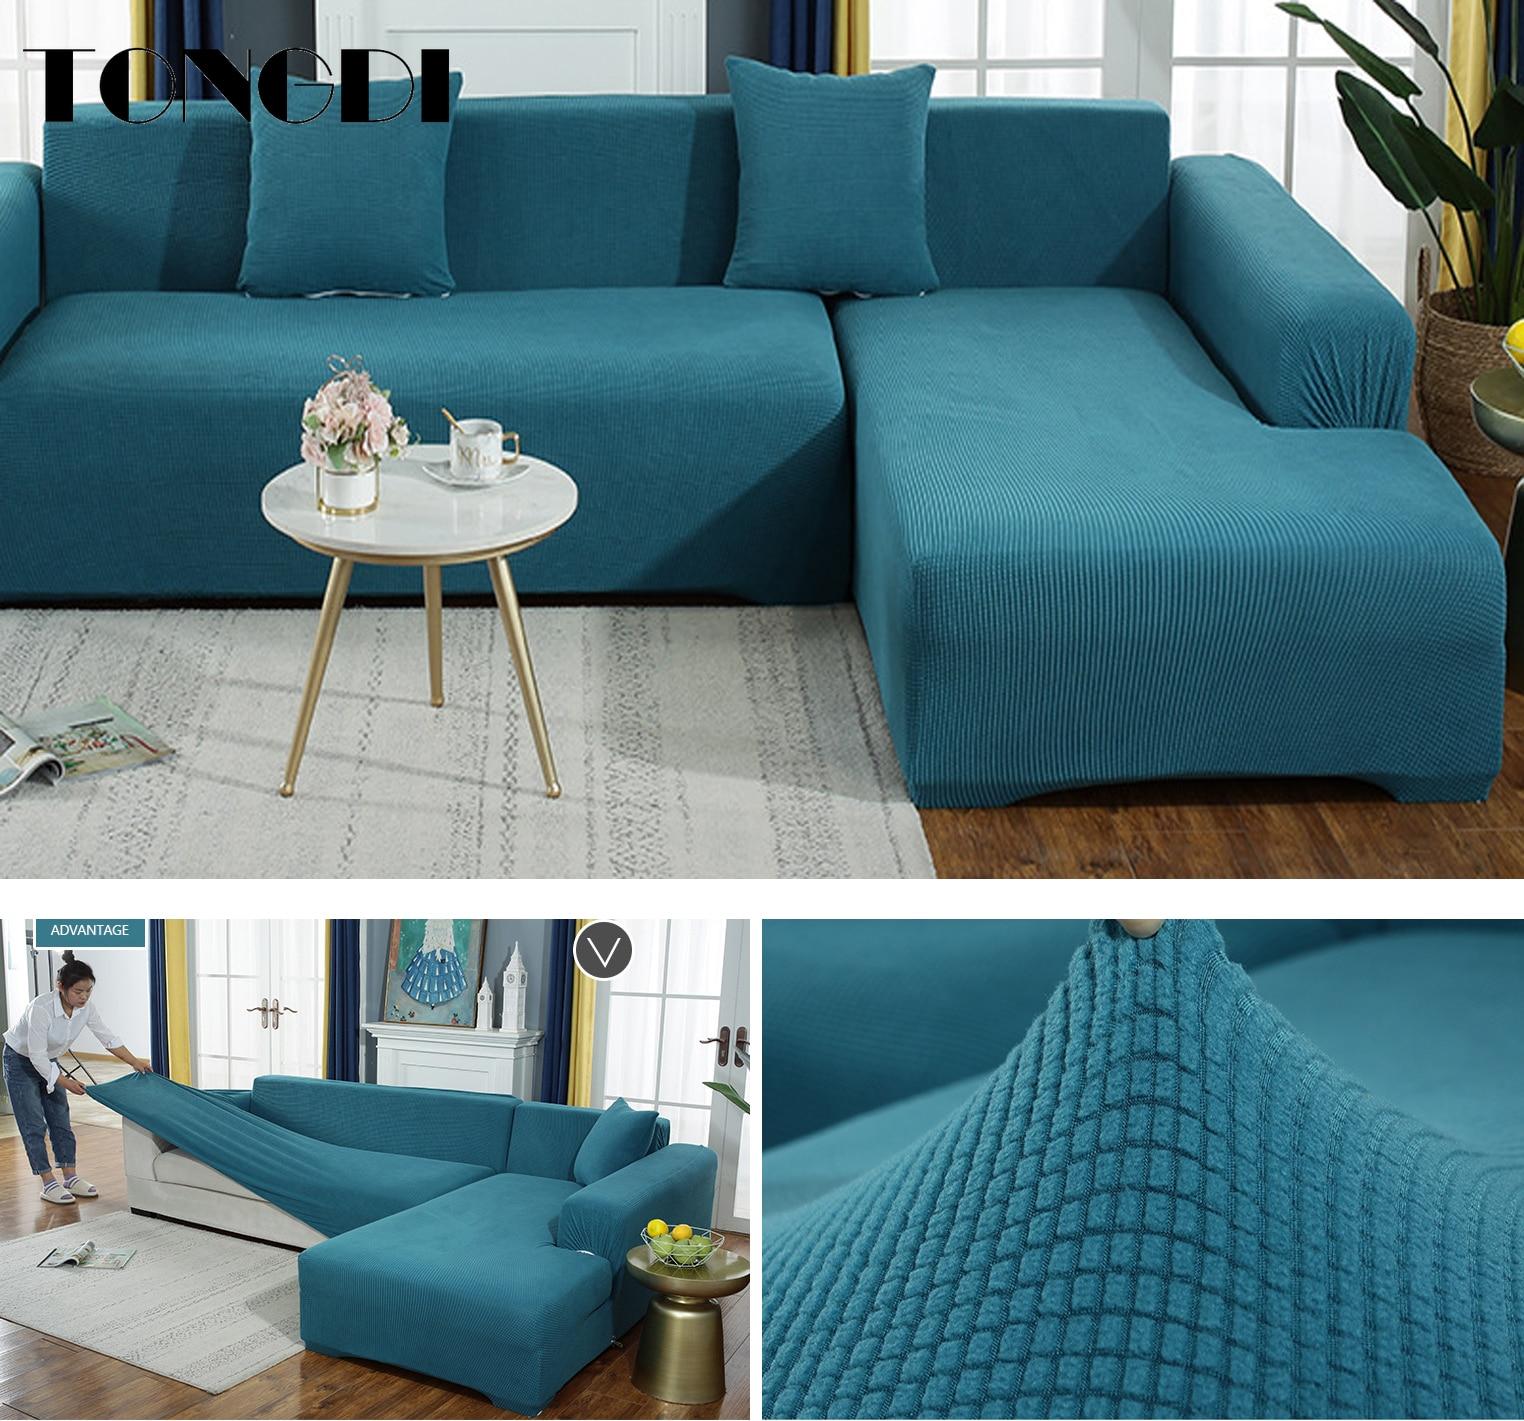 TONGDI Lustrous Elastic Sofa Cover Soft Elegant All inclusive Velvet Luxury Pretty Decor Slipcover Couch For